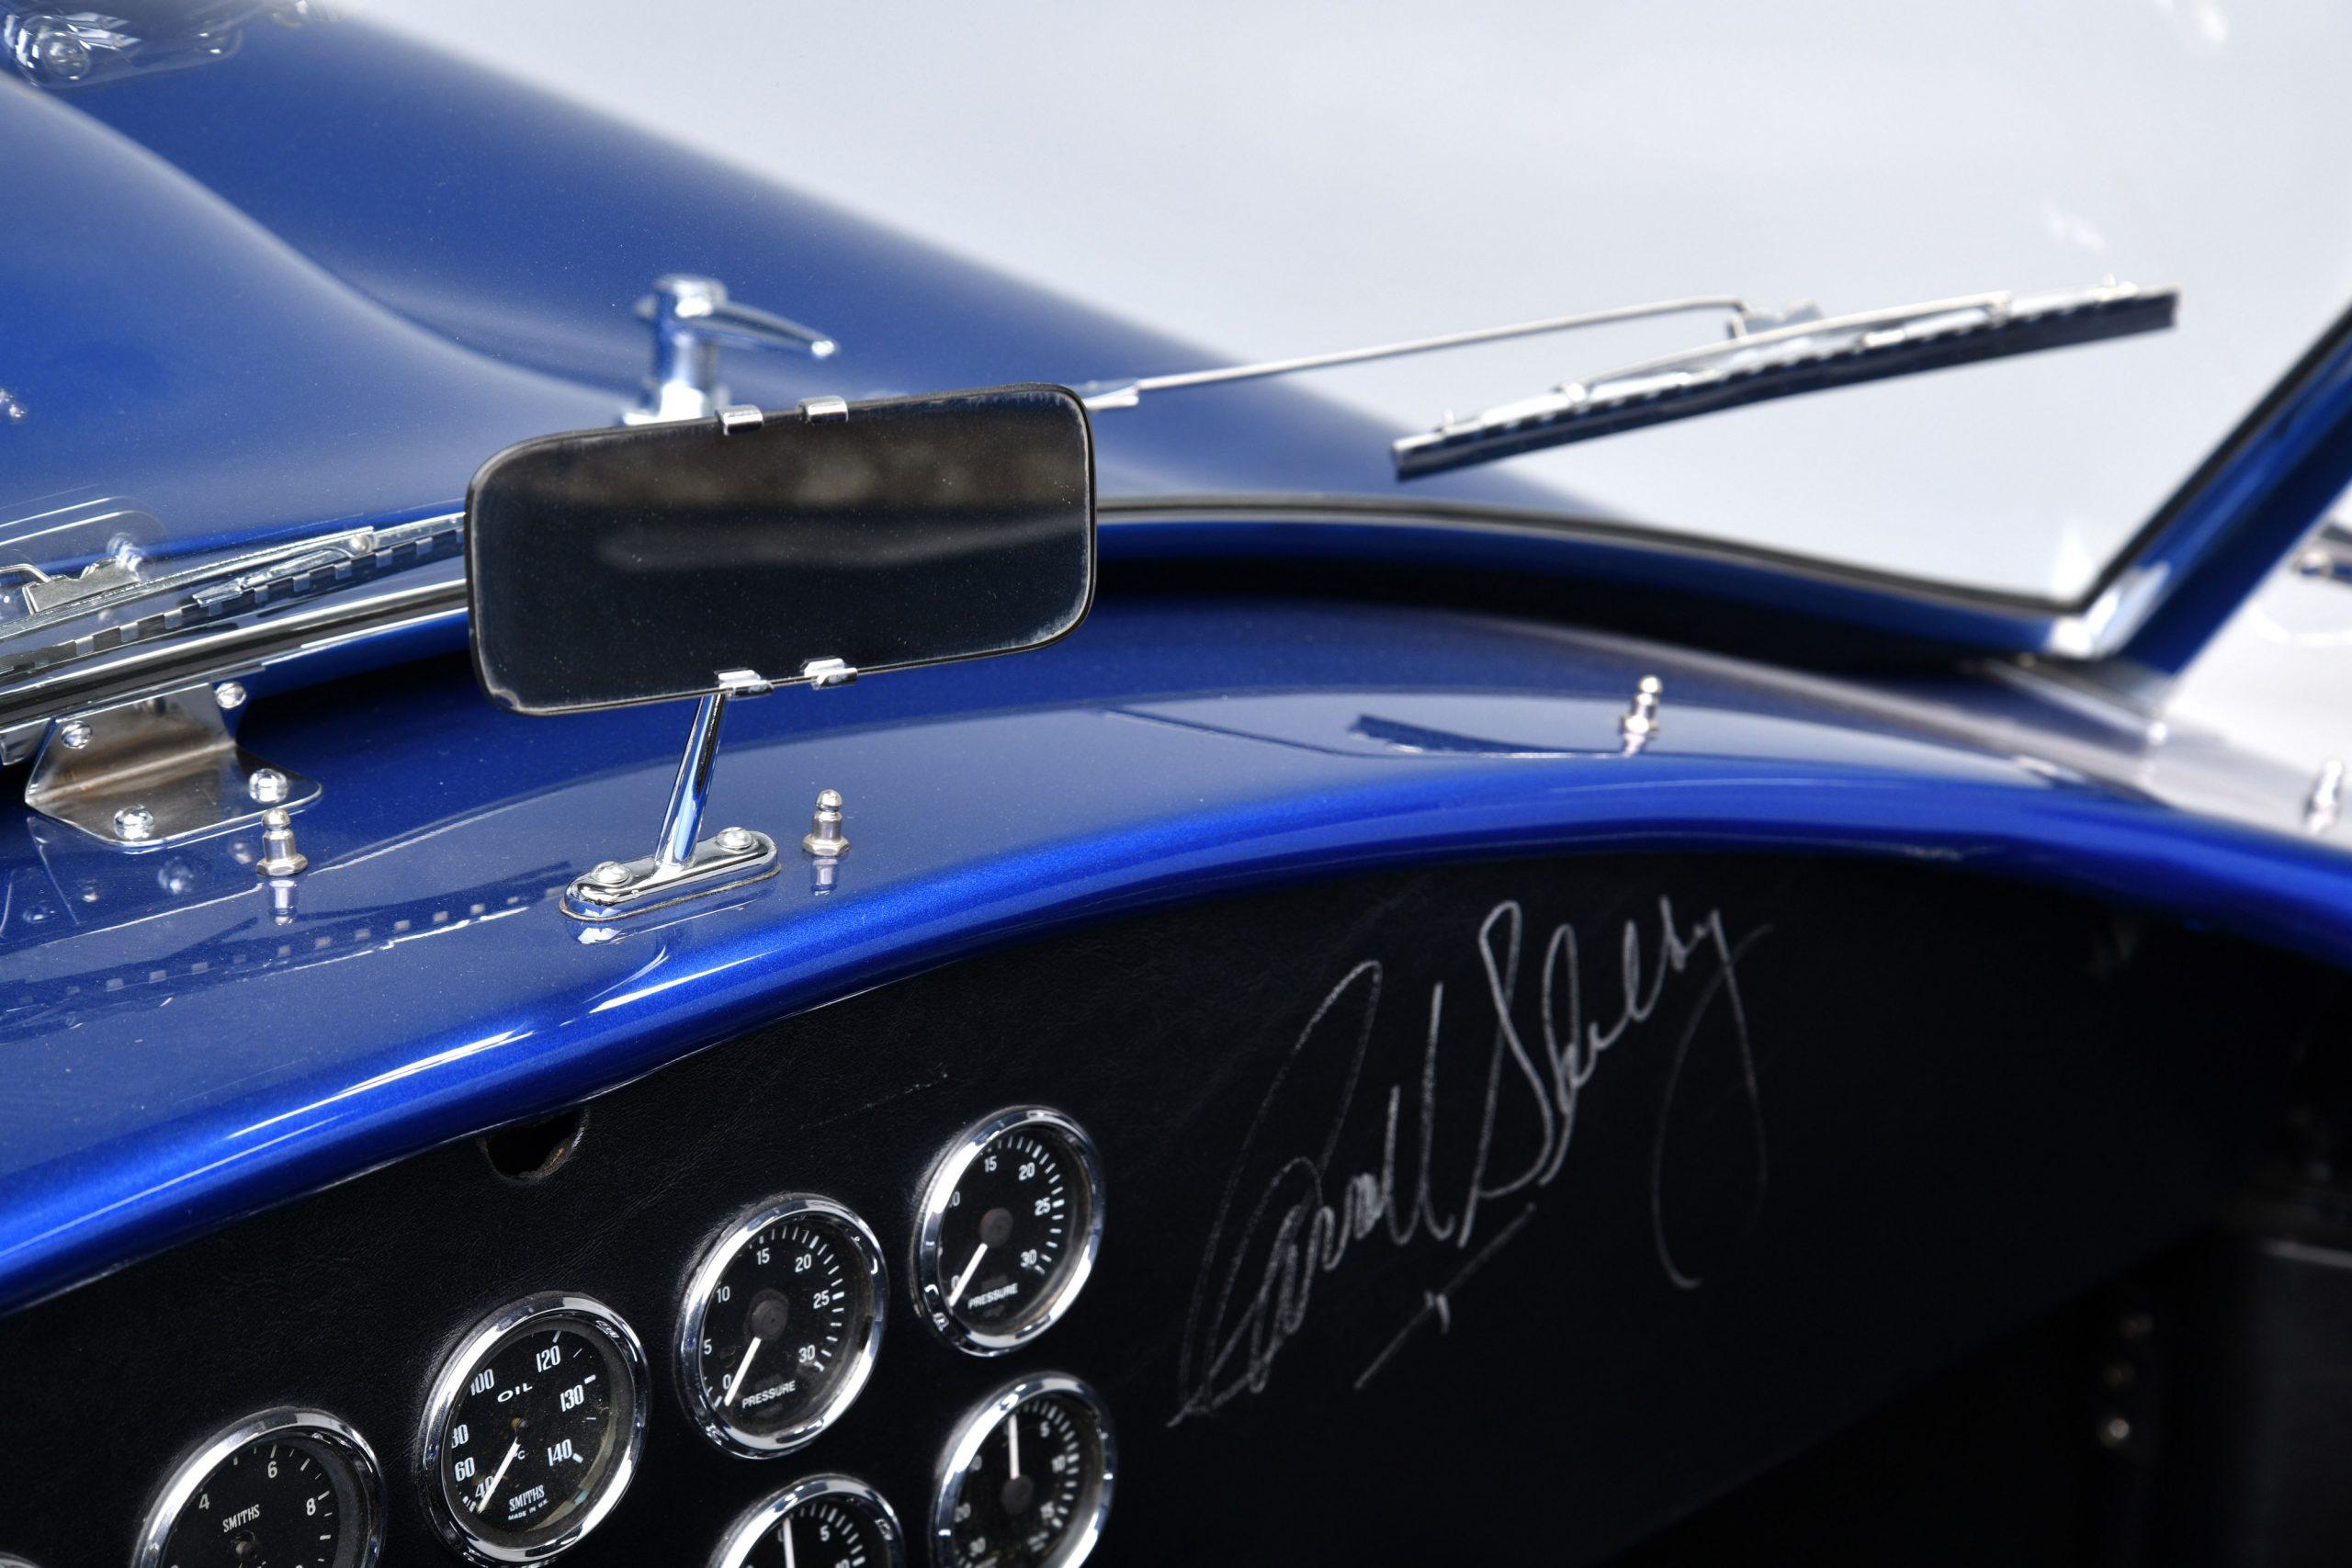 CSX 3015 Shelby Cobra interior rear view mirror